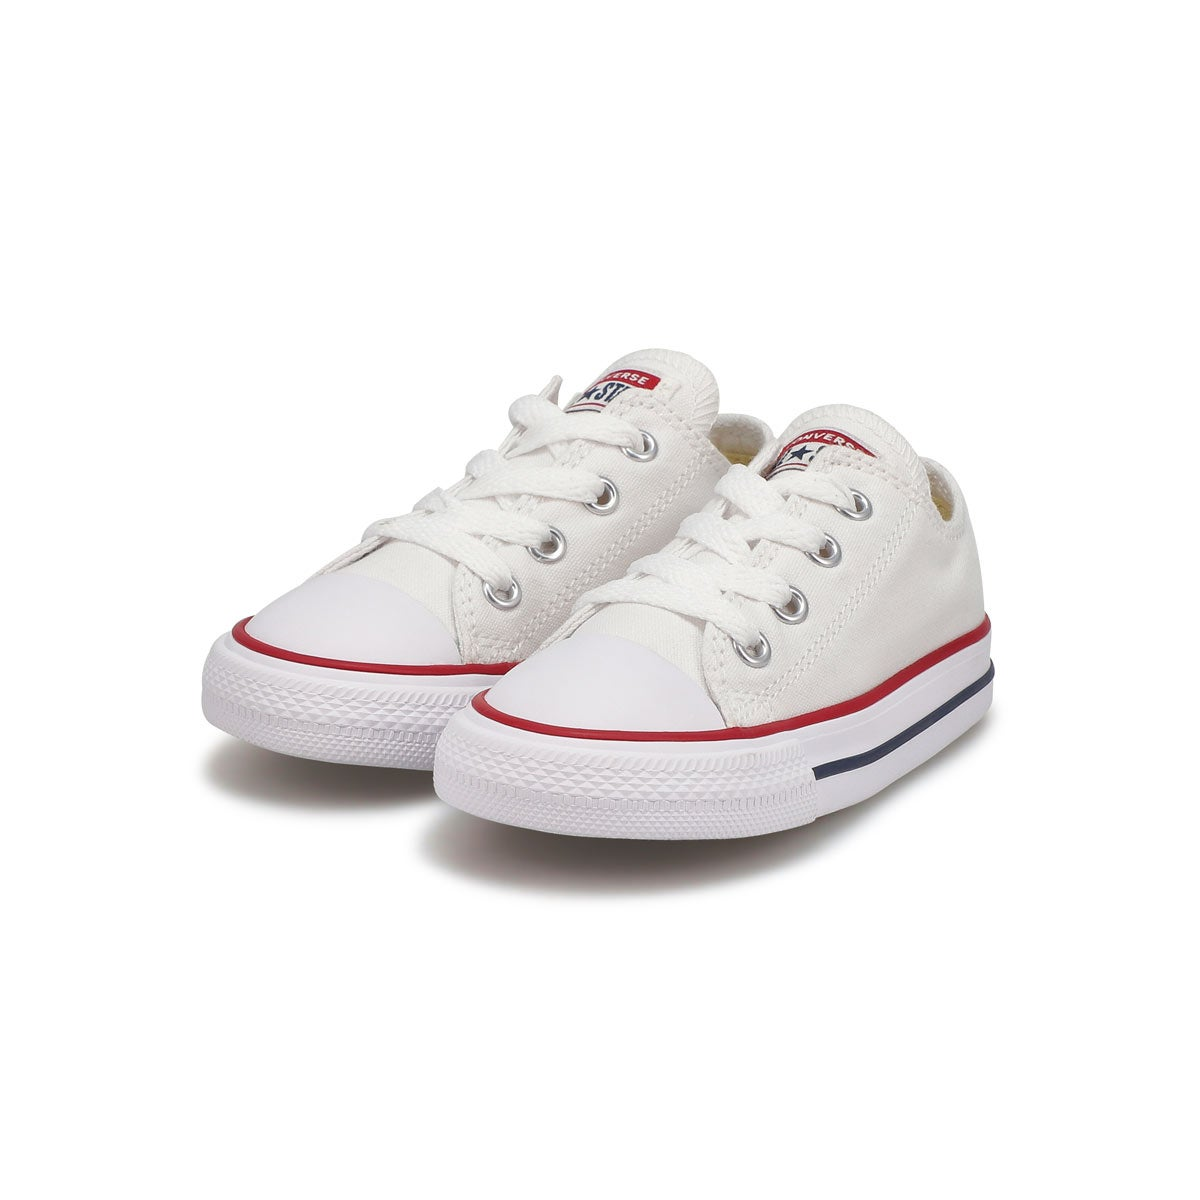 Infs CTAS Core white sneaker